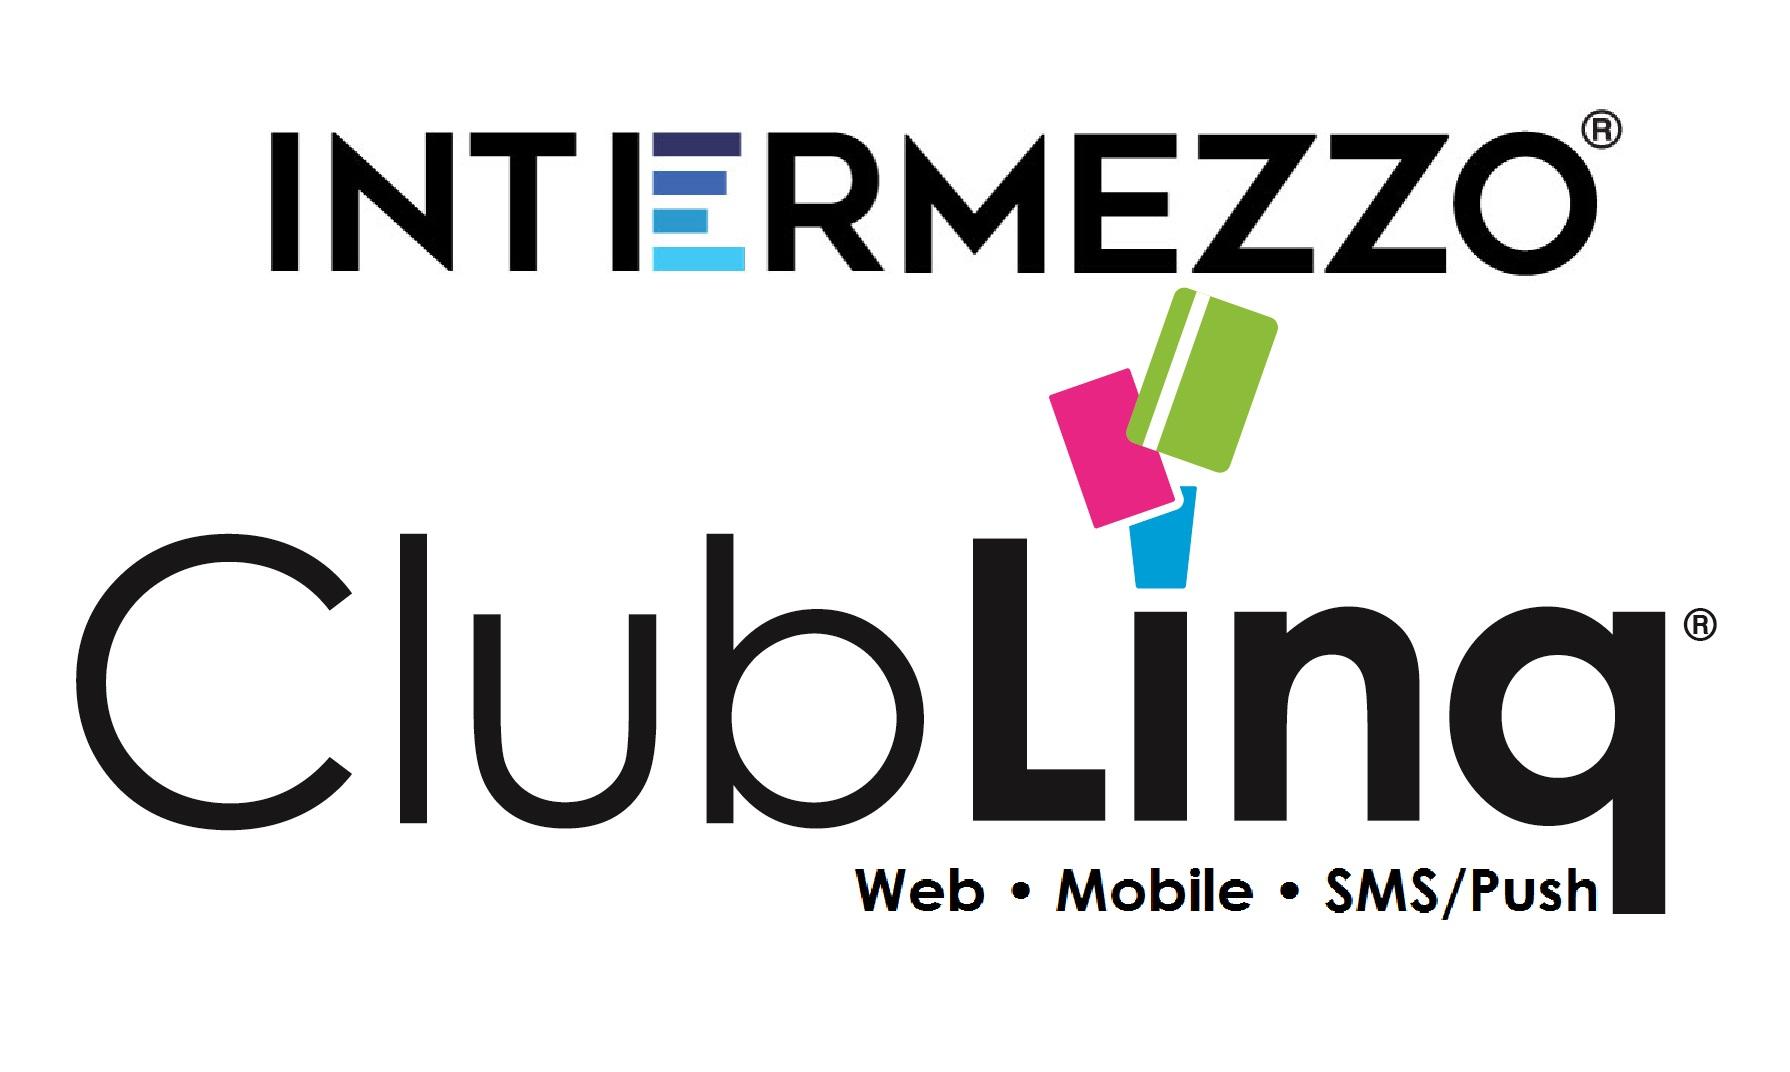 Intermezzo logo